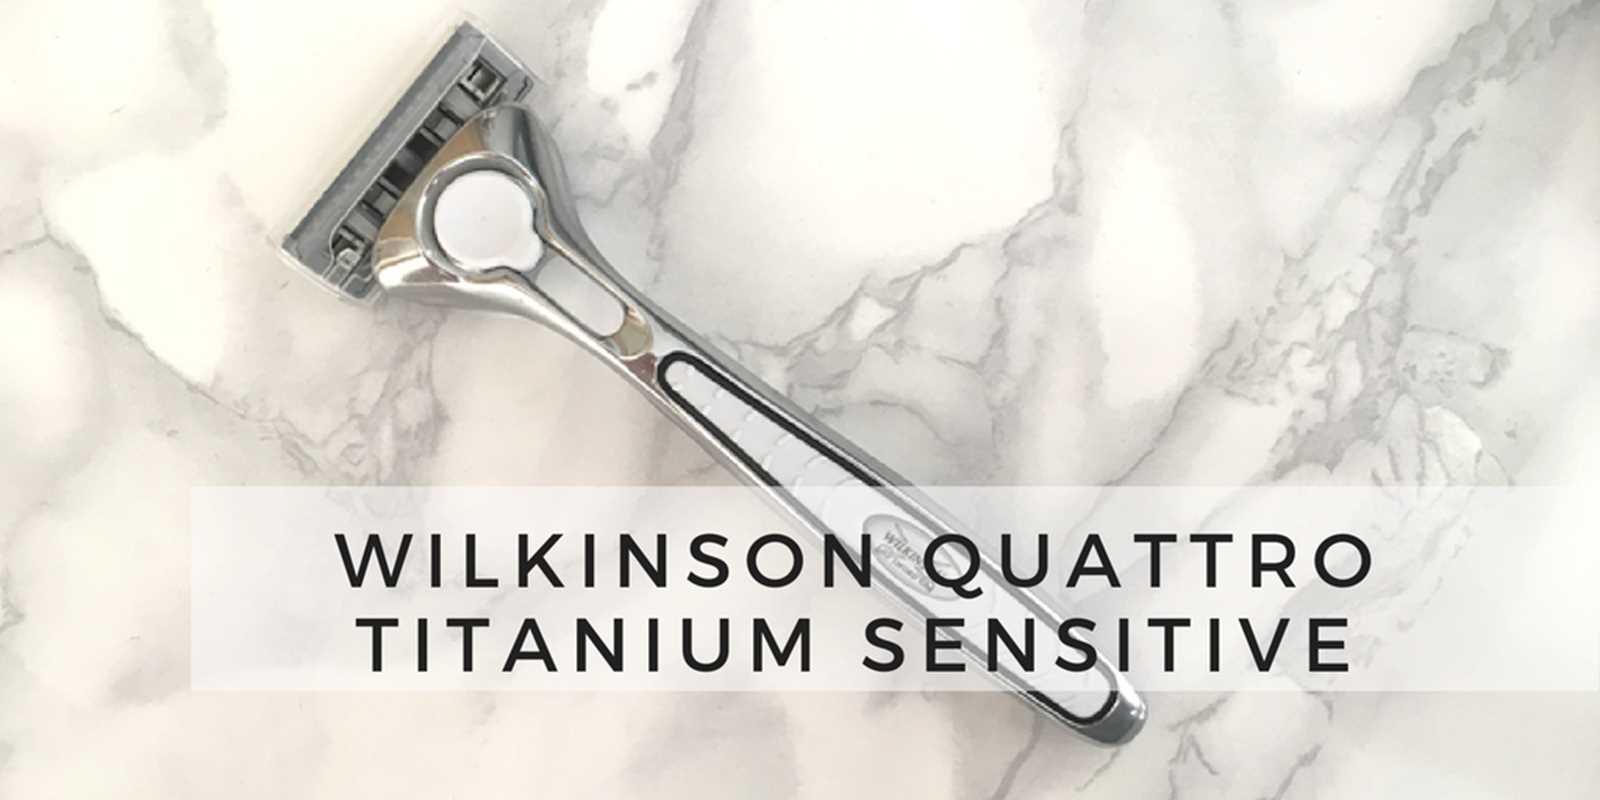 Maszynka Wilkinson quattro titanium sensitive